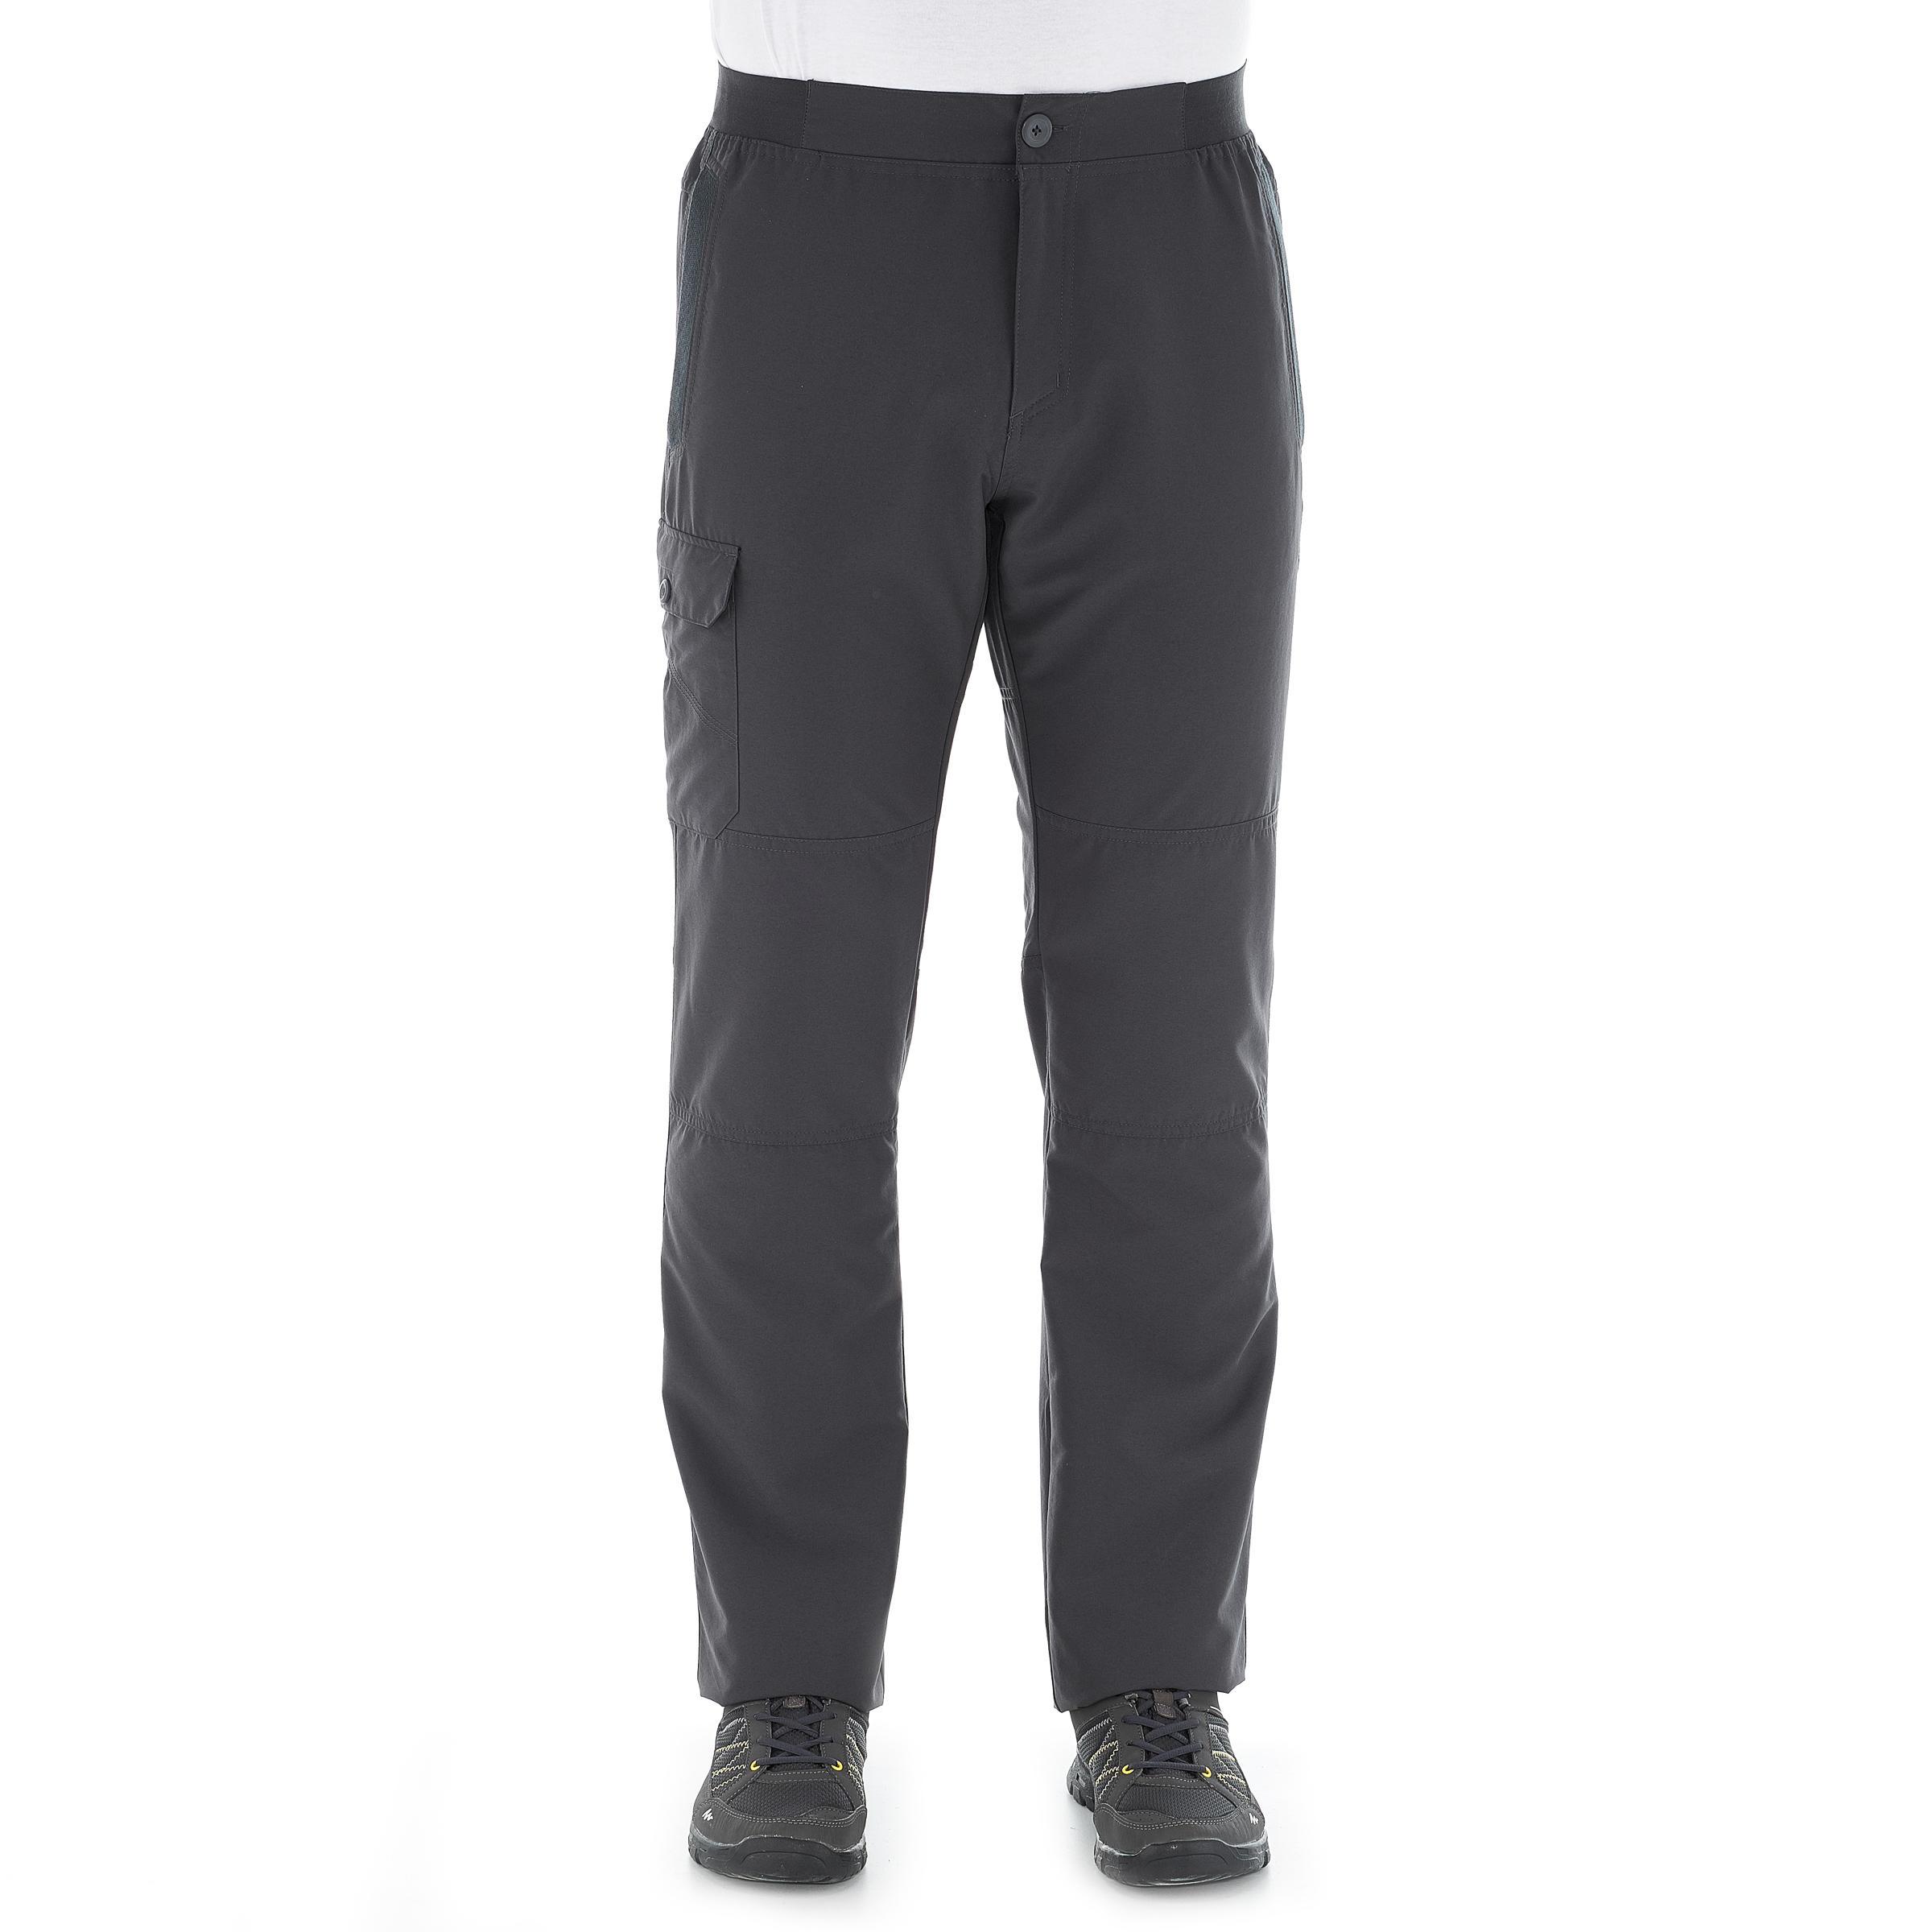 Men's Hiking Trousers NH100 - Grey